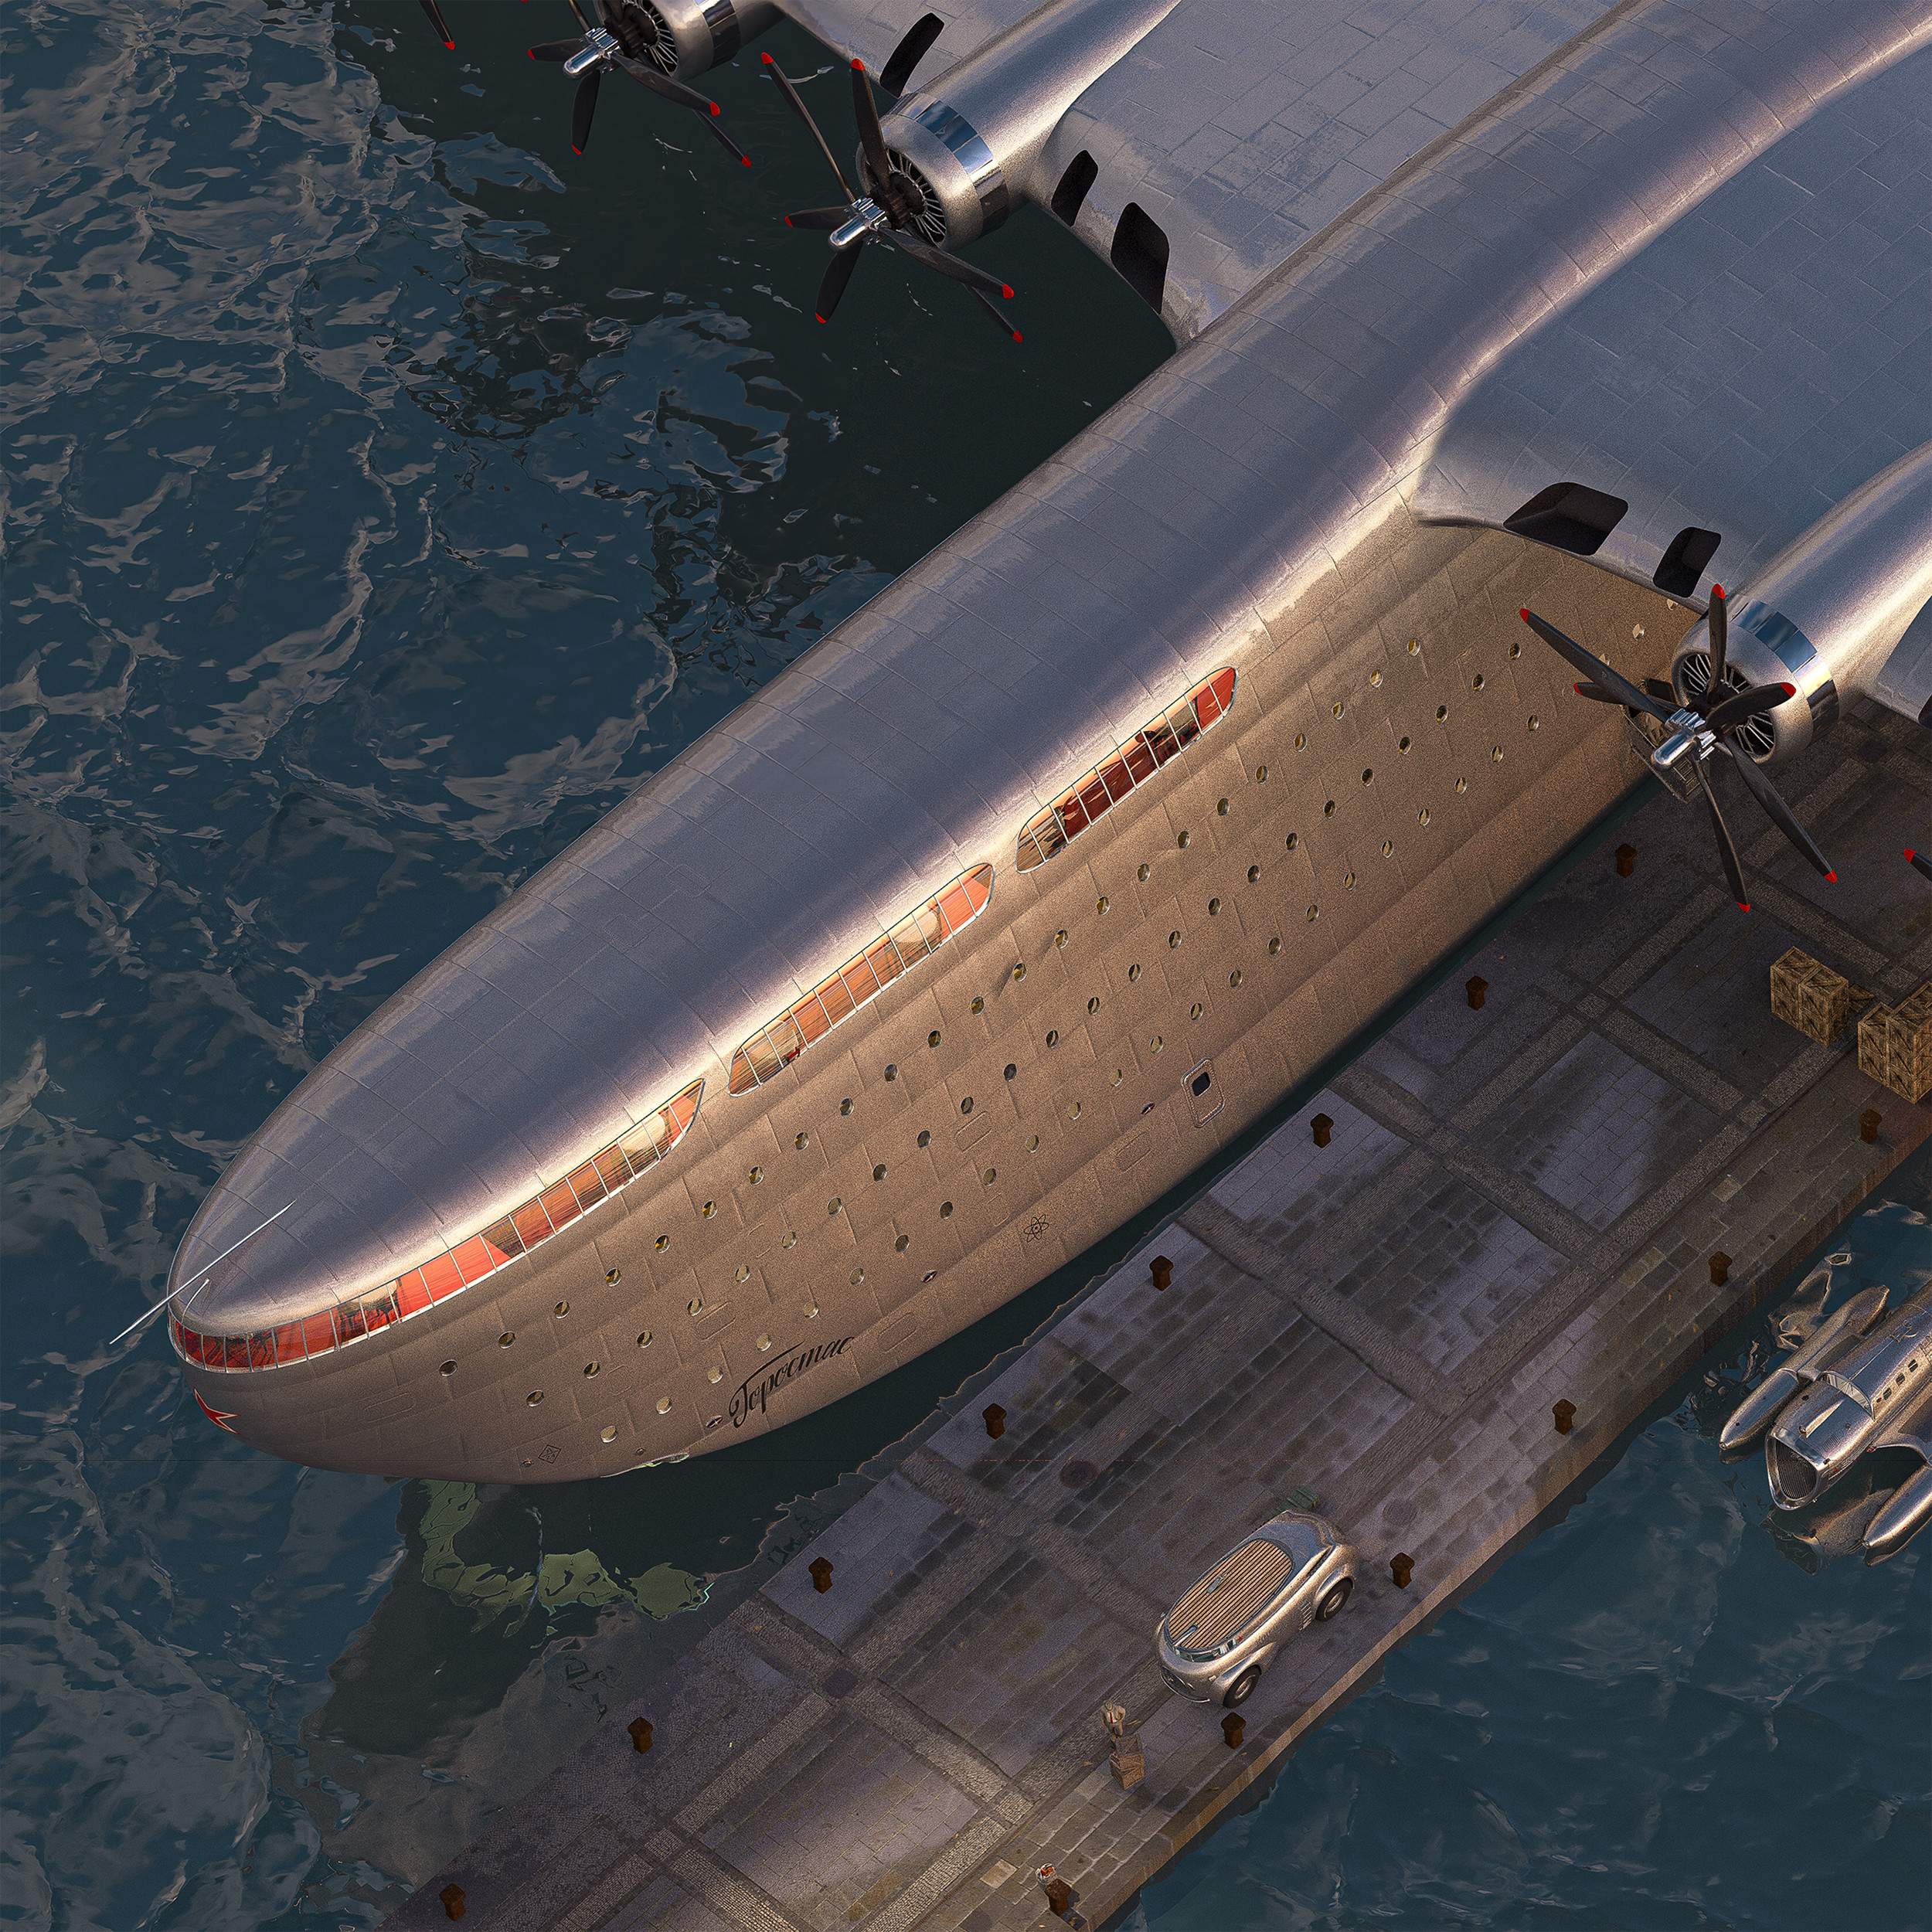 Docked at Odesa port.